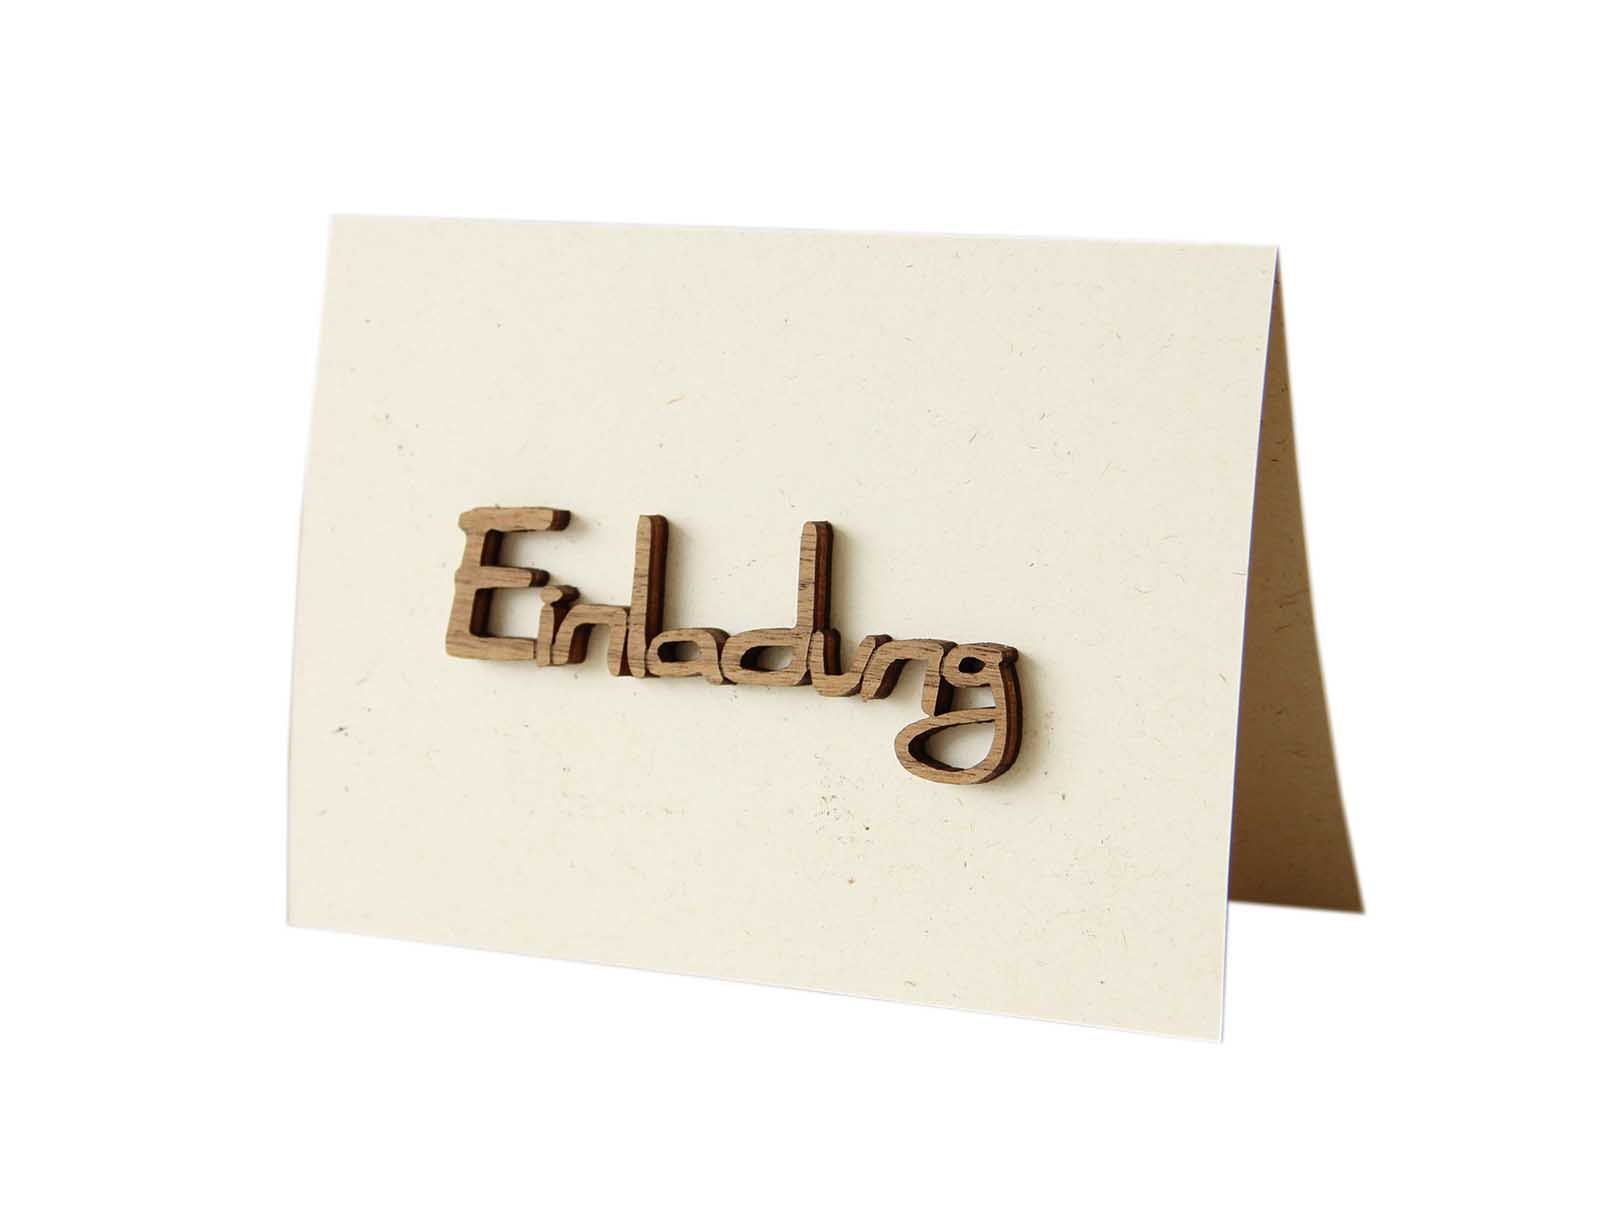 "Original Holzgrußkarte - Papierkarte mit Schriftzug aus Echtholz in Nuss ""Einladung"", Postkarte, Geschenkkarte, Klappkarte, Karte, Einladungskarte"